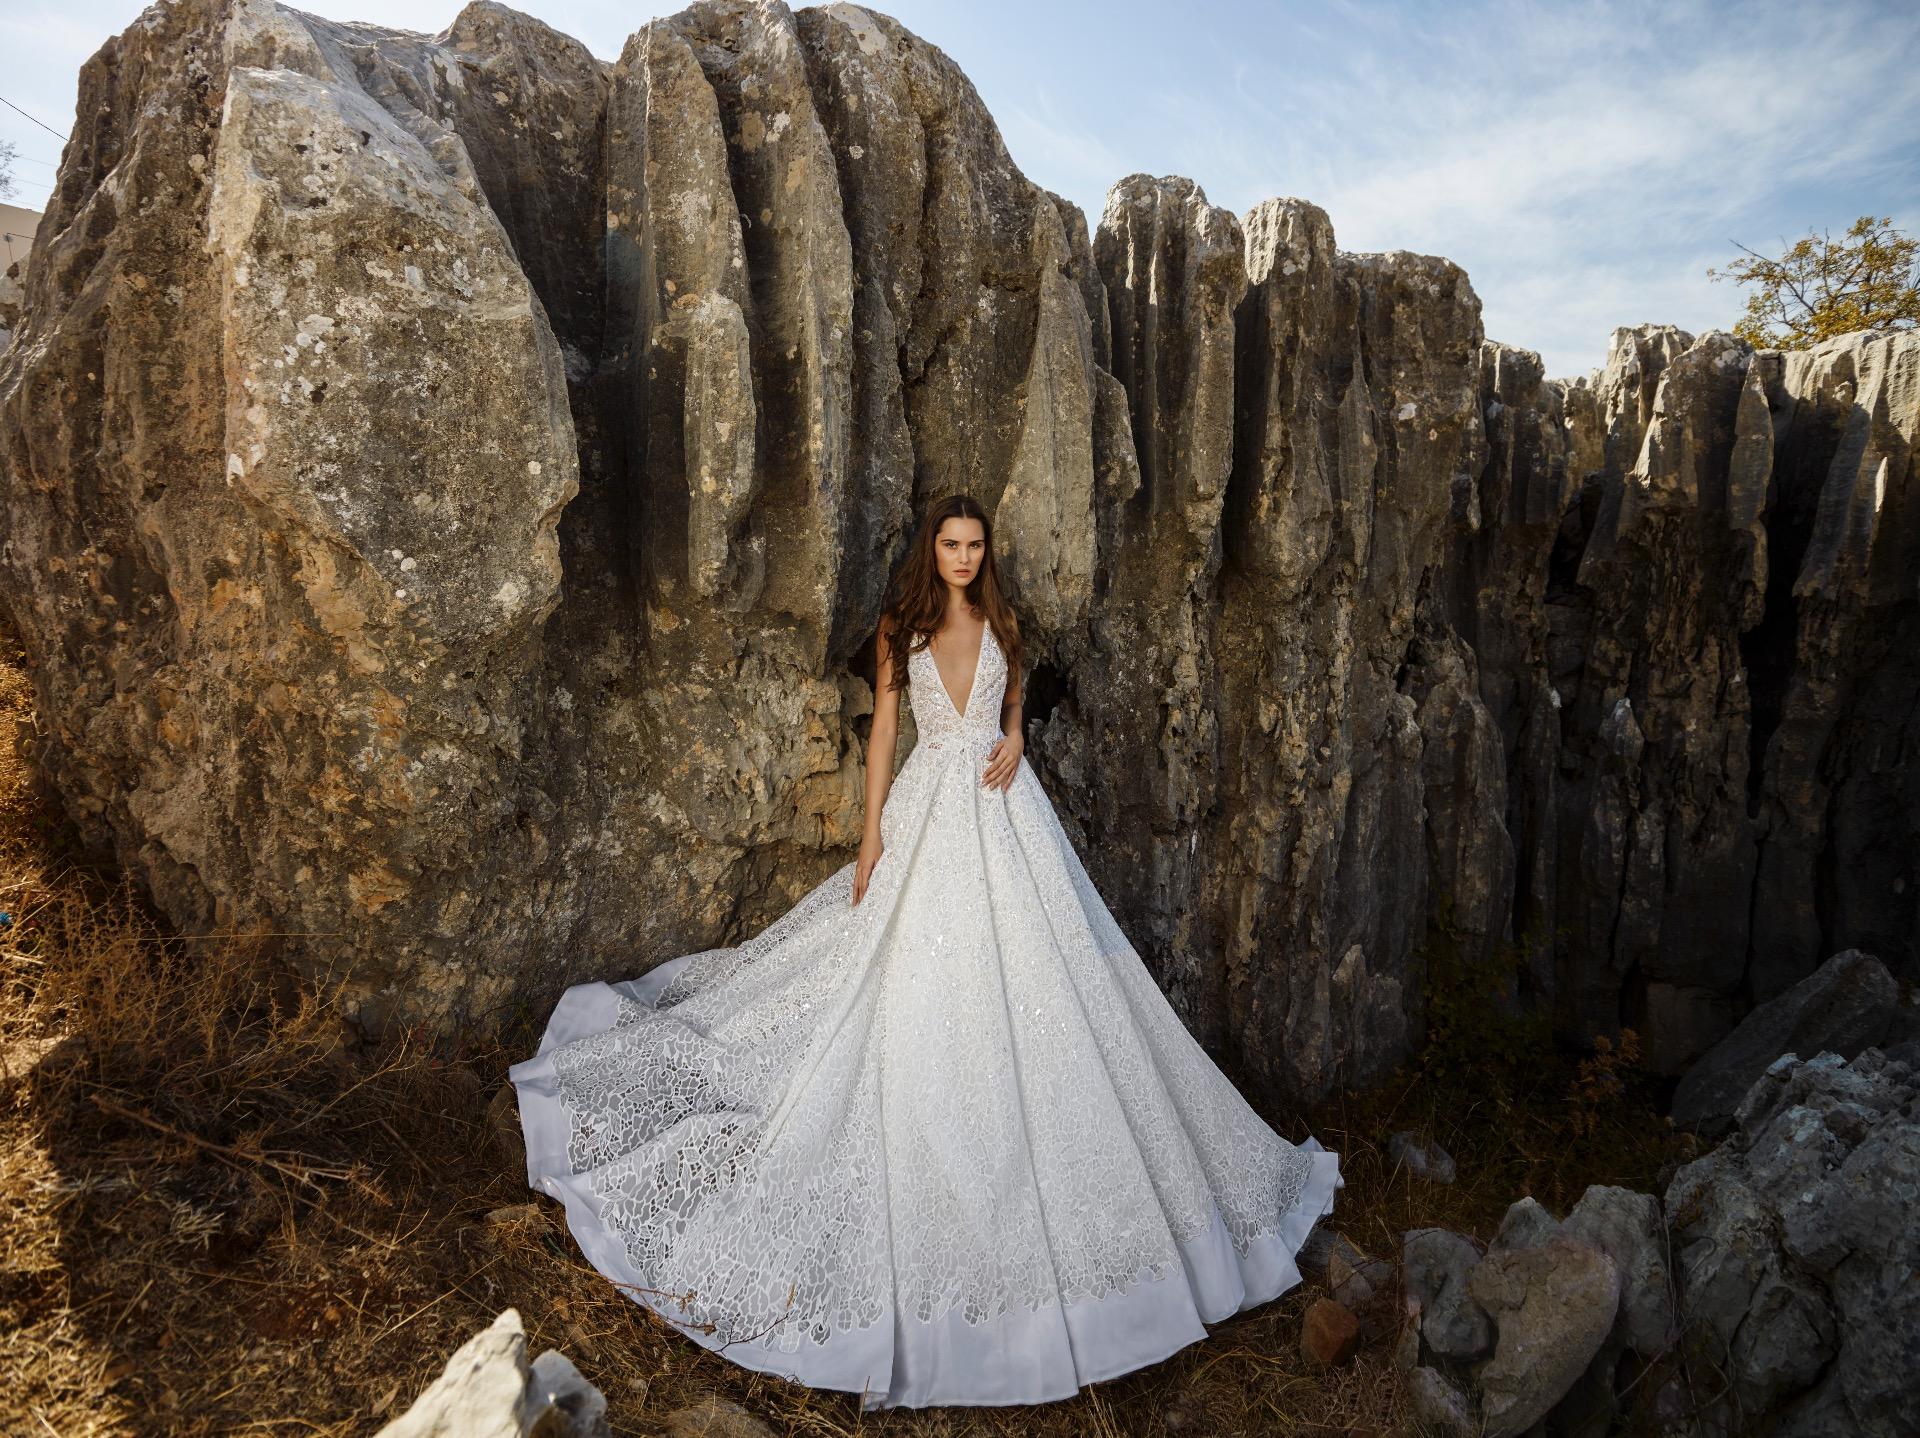 Snow-Petal bridal gown by Tony Ward